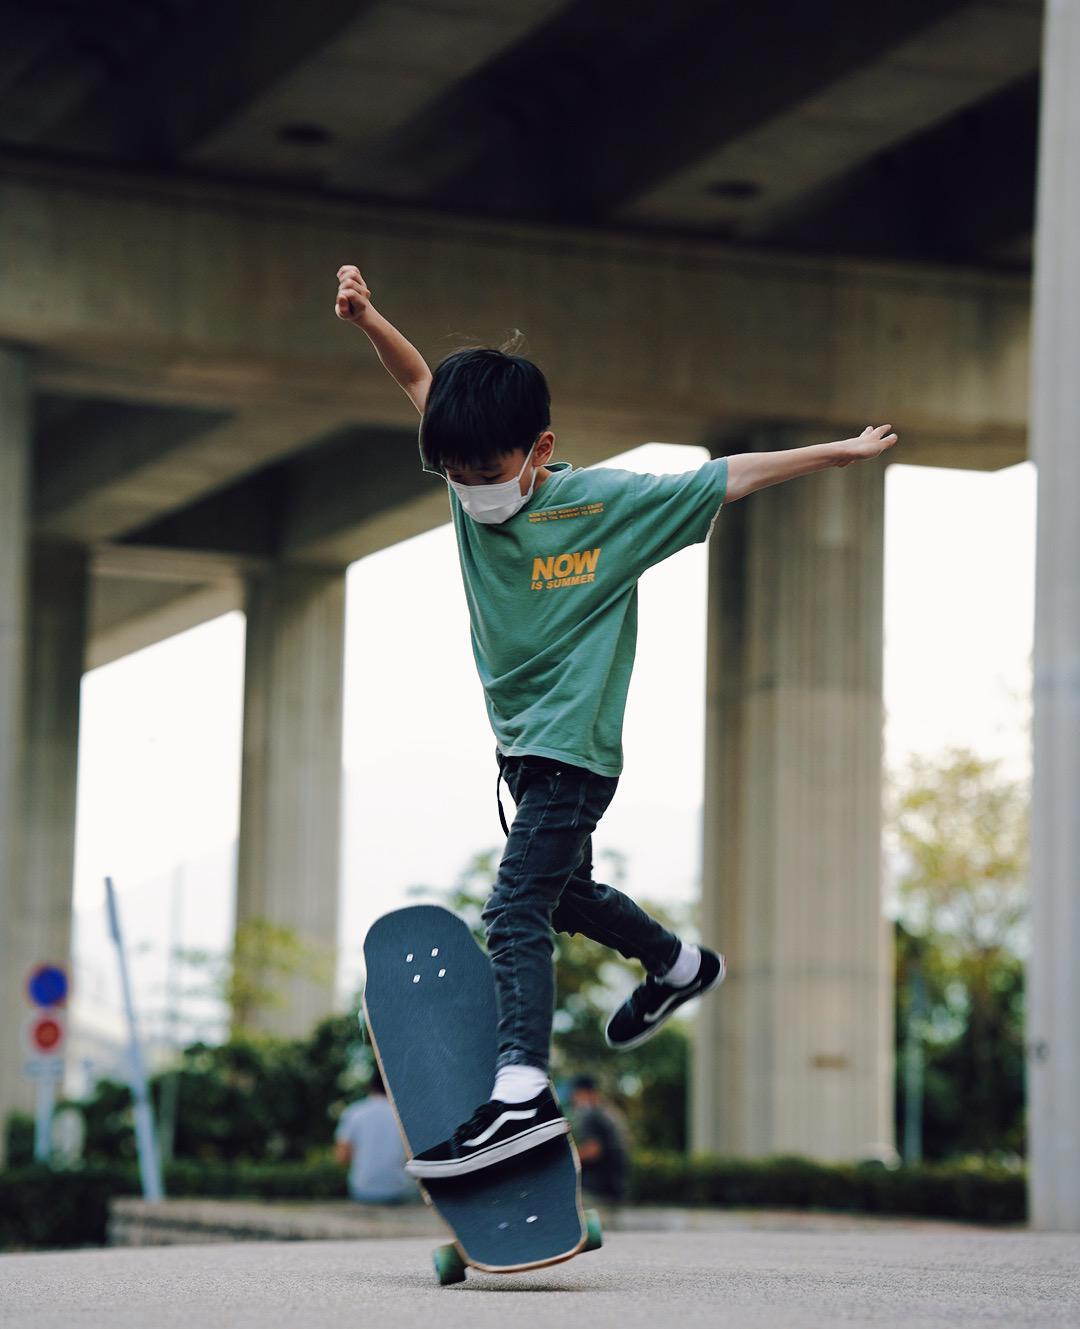 { en: 'Travelol Hong Kong Long Board Course', cn: 'Travelol 香港長板課程' } 0